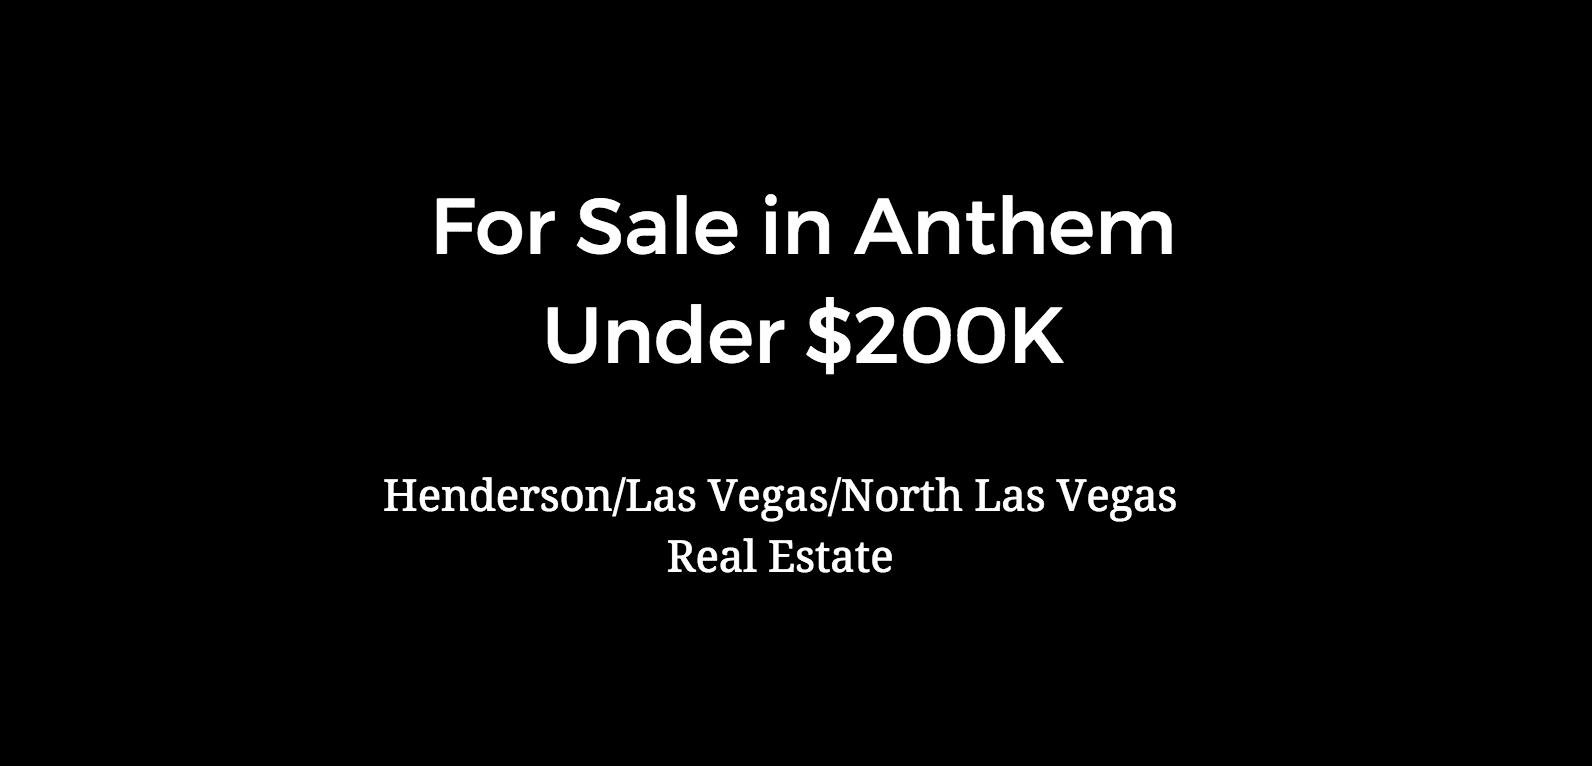 homes for sale in anthem under 200k